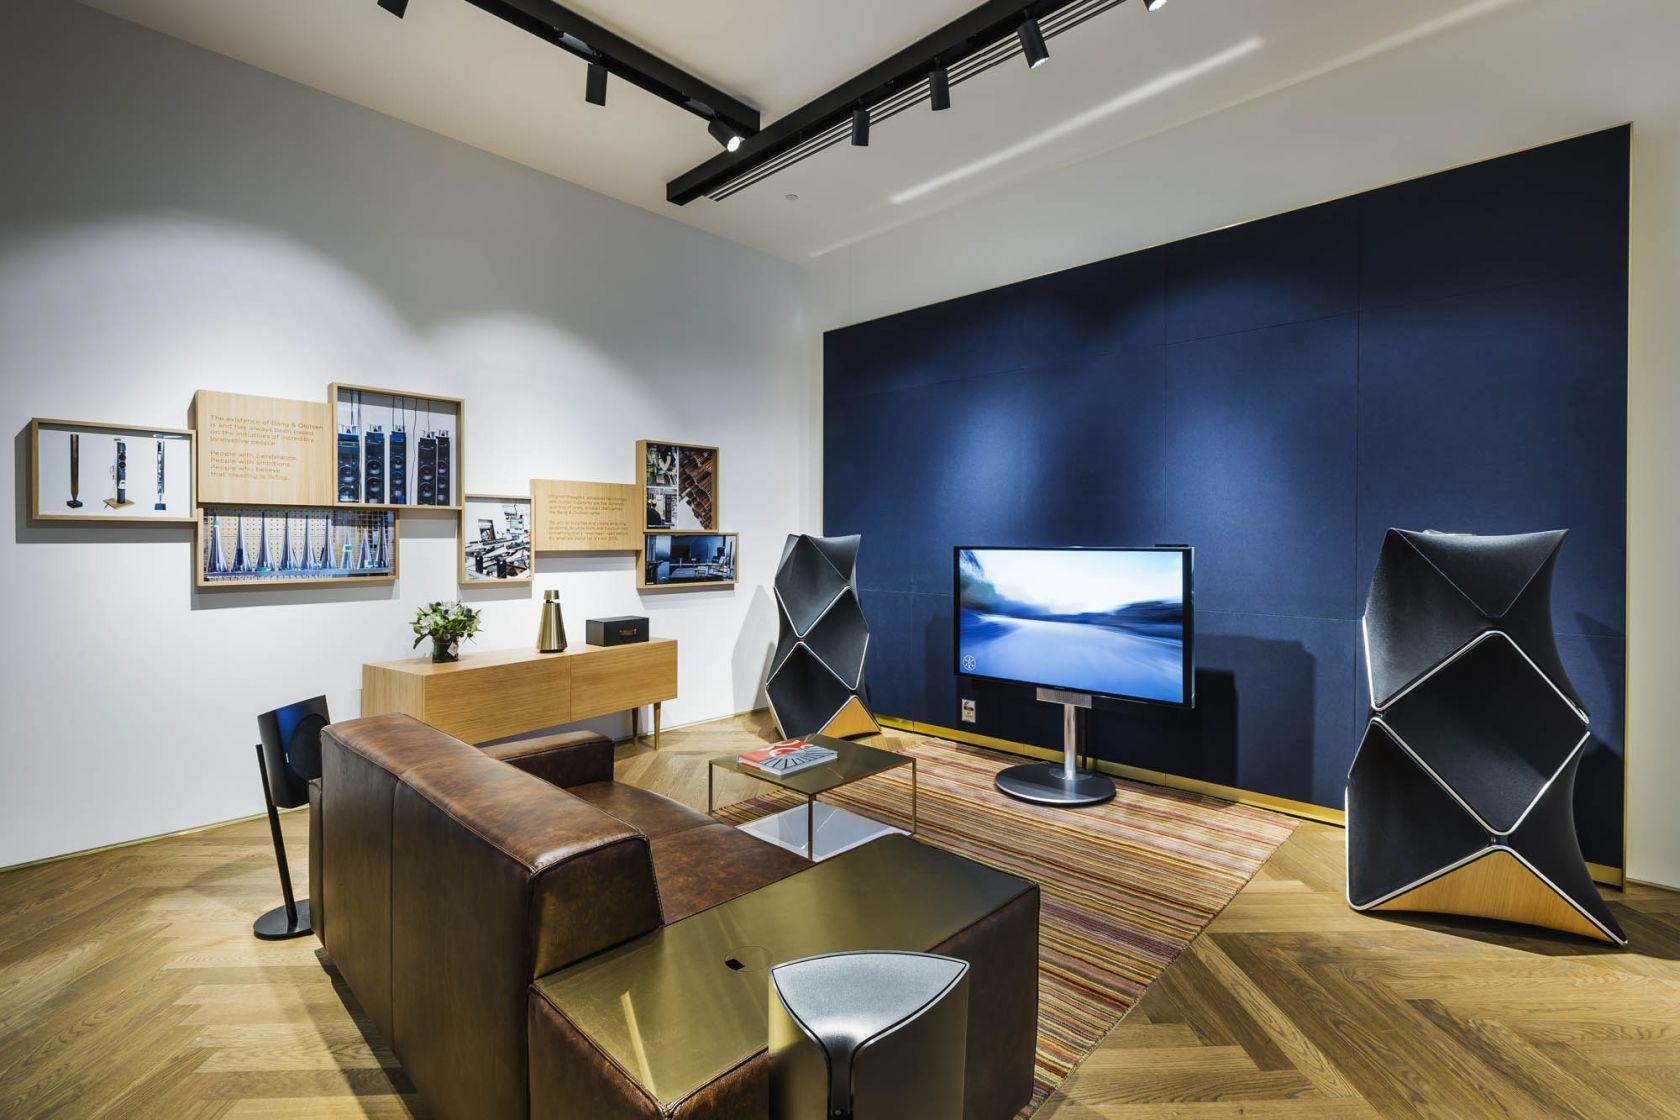 bang and olufsen retail sydney bondi showroom herringbone timber directional track lighting lounge experience